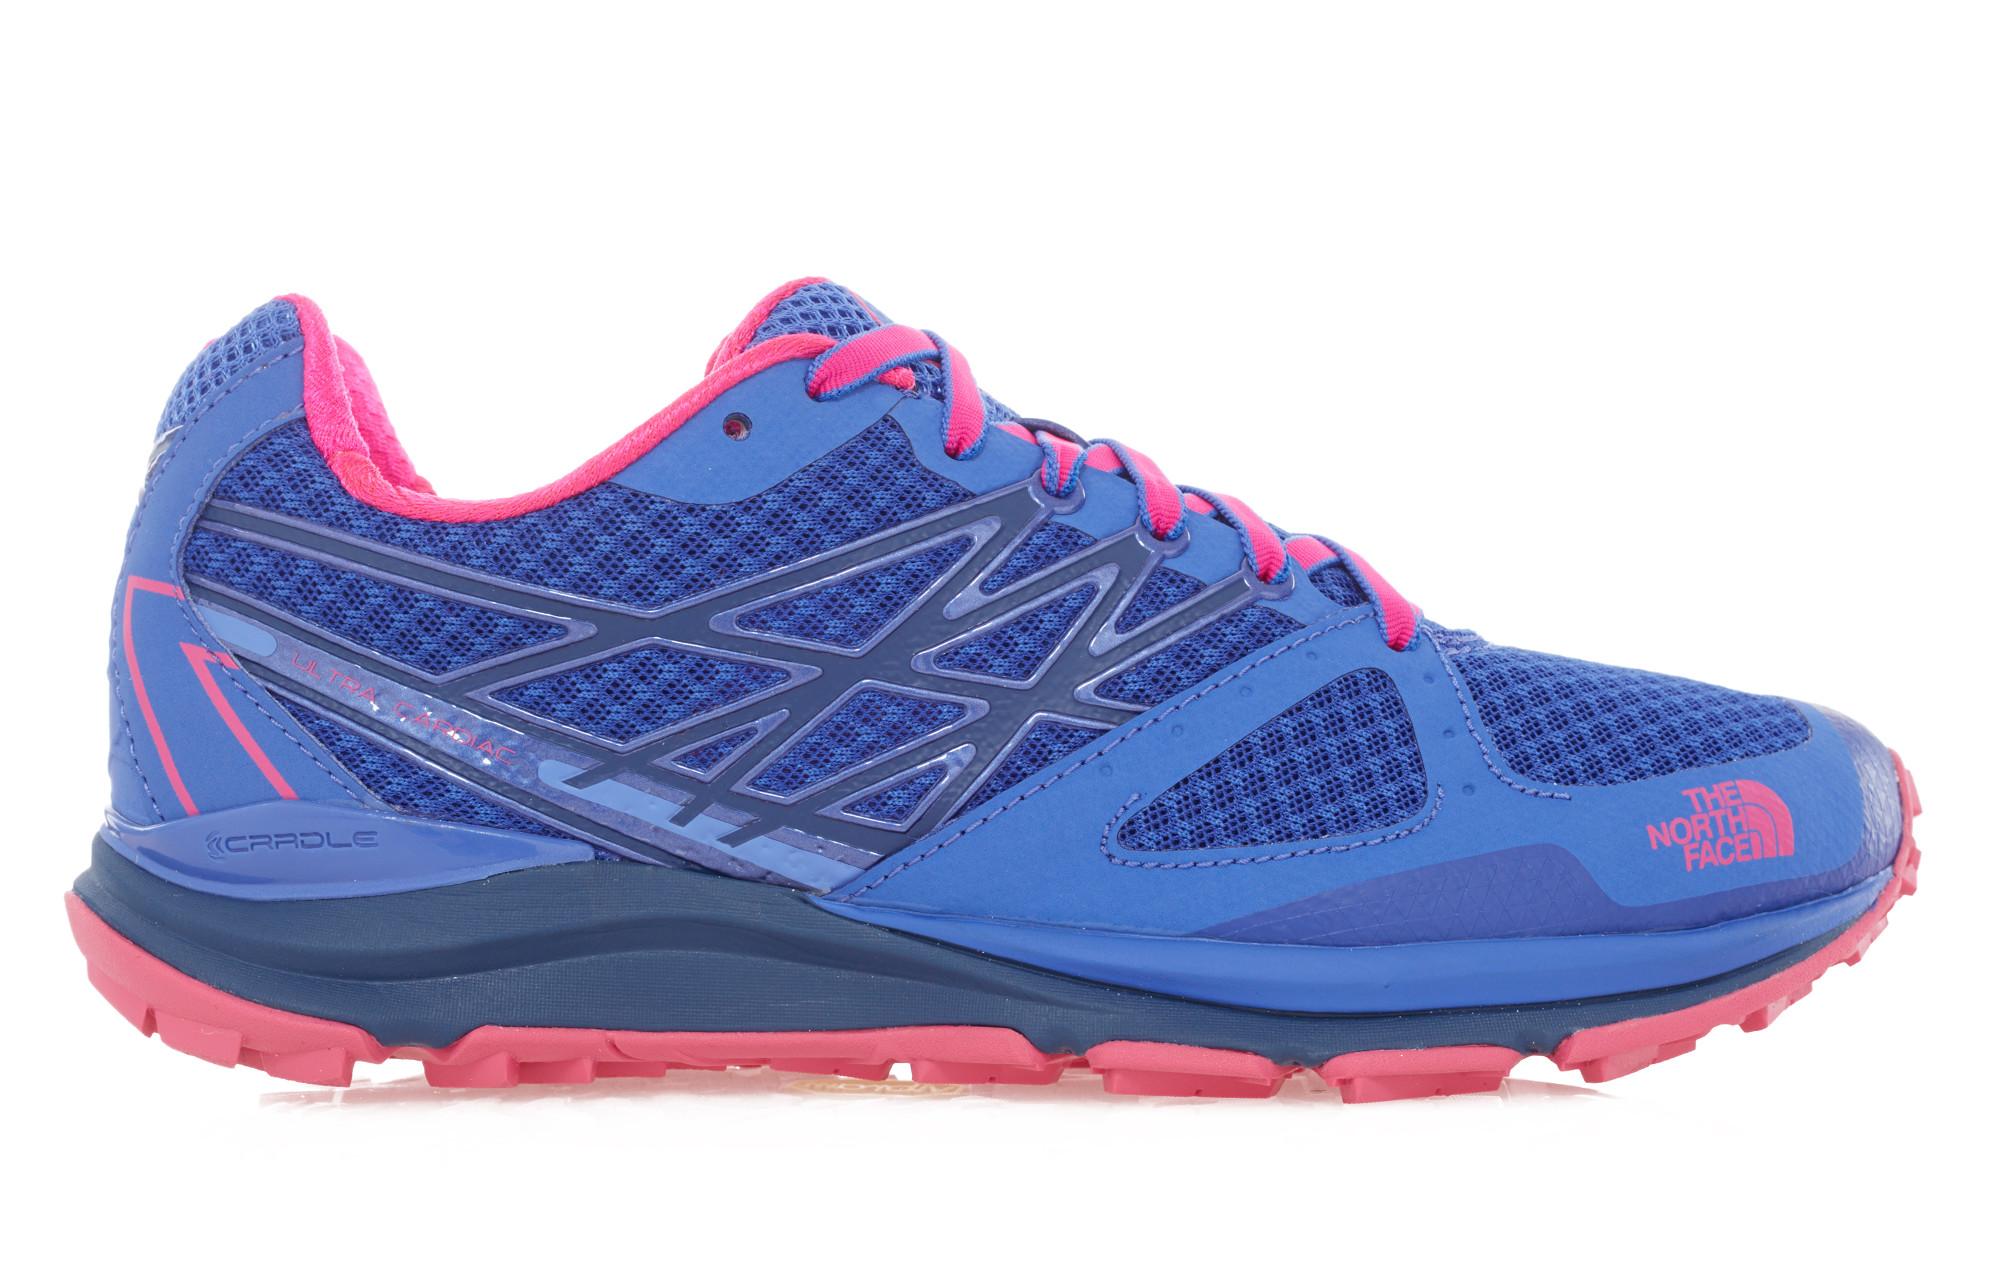 Shoes ULTRA CARDIAC Blue Pink Women